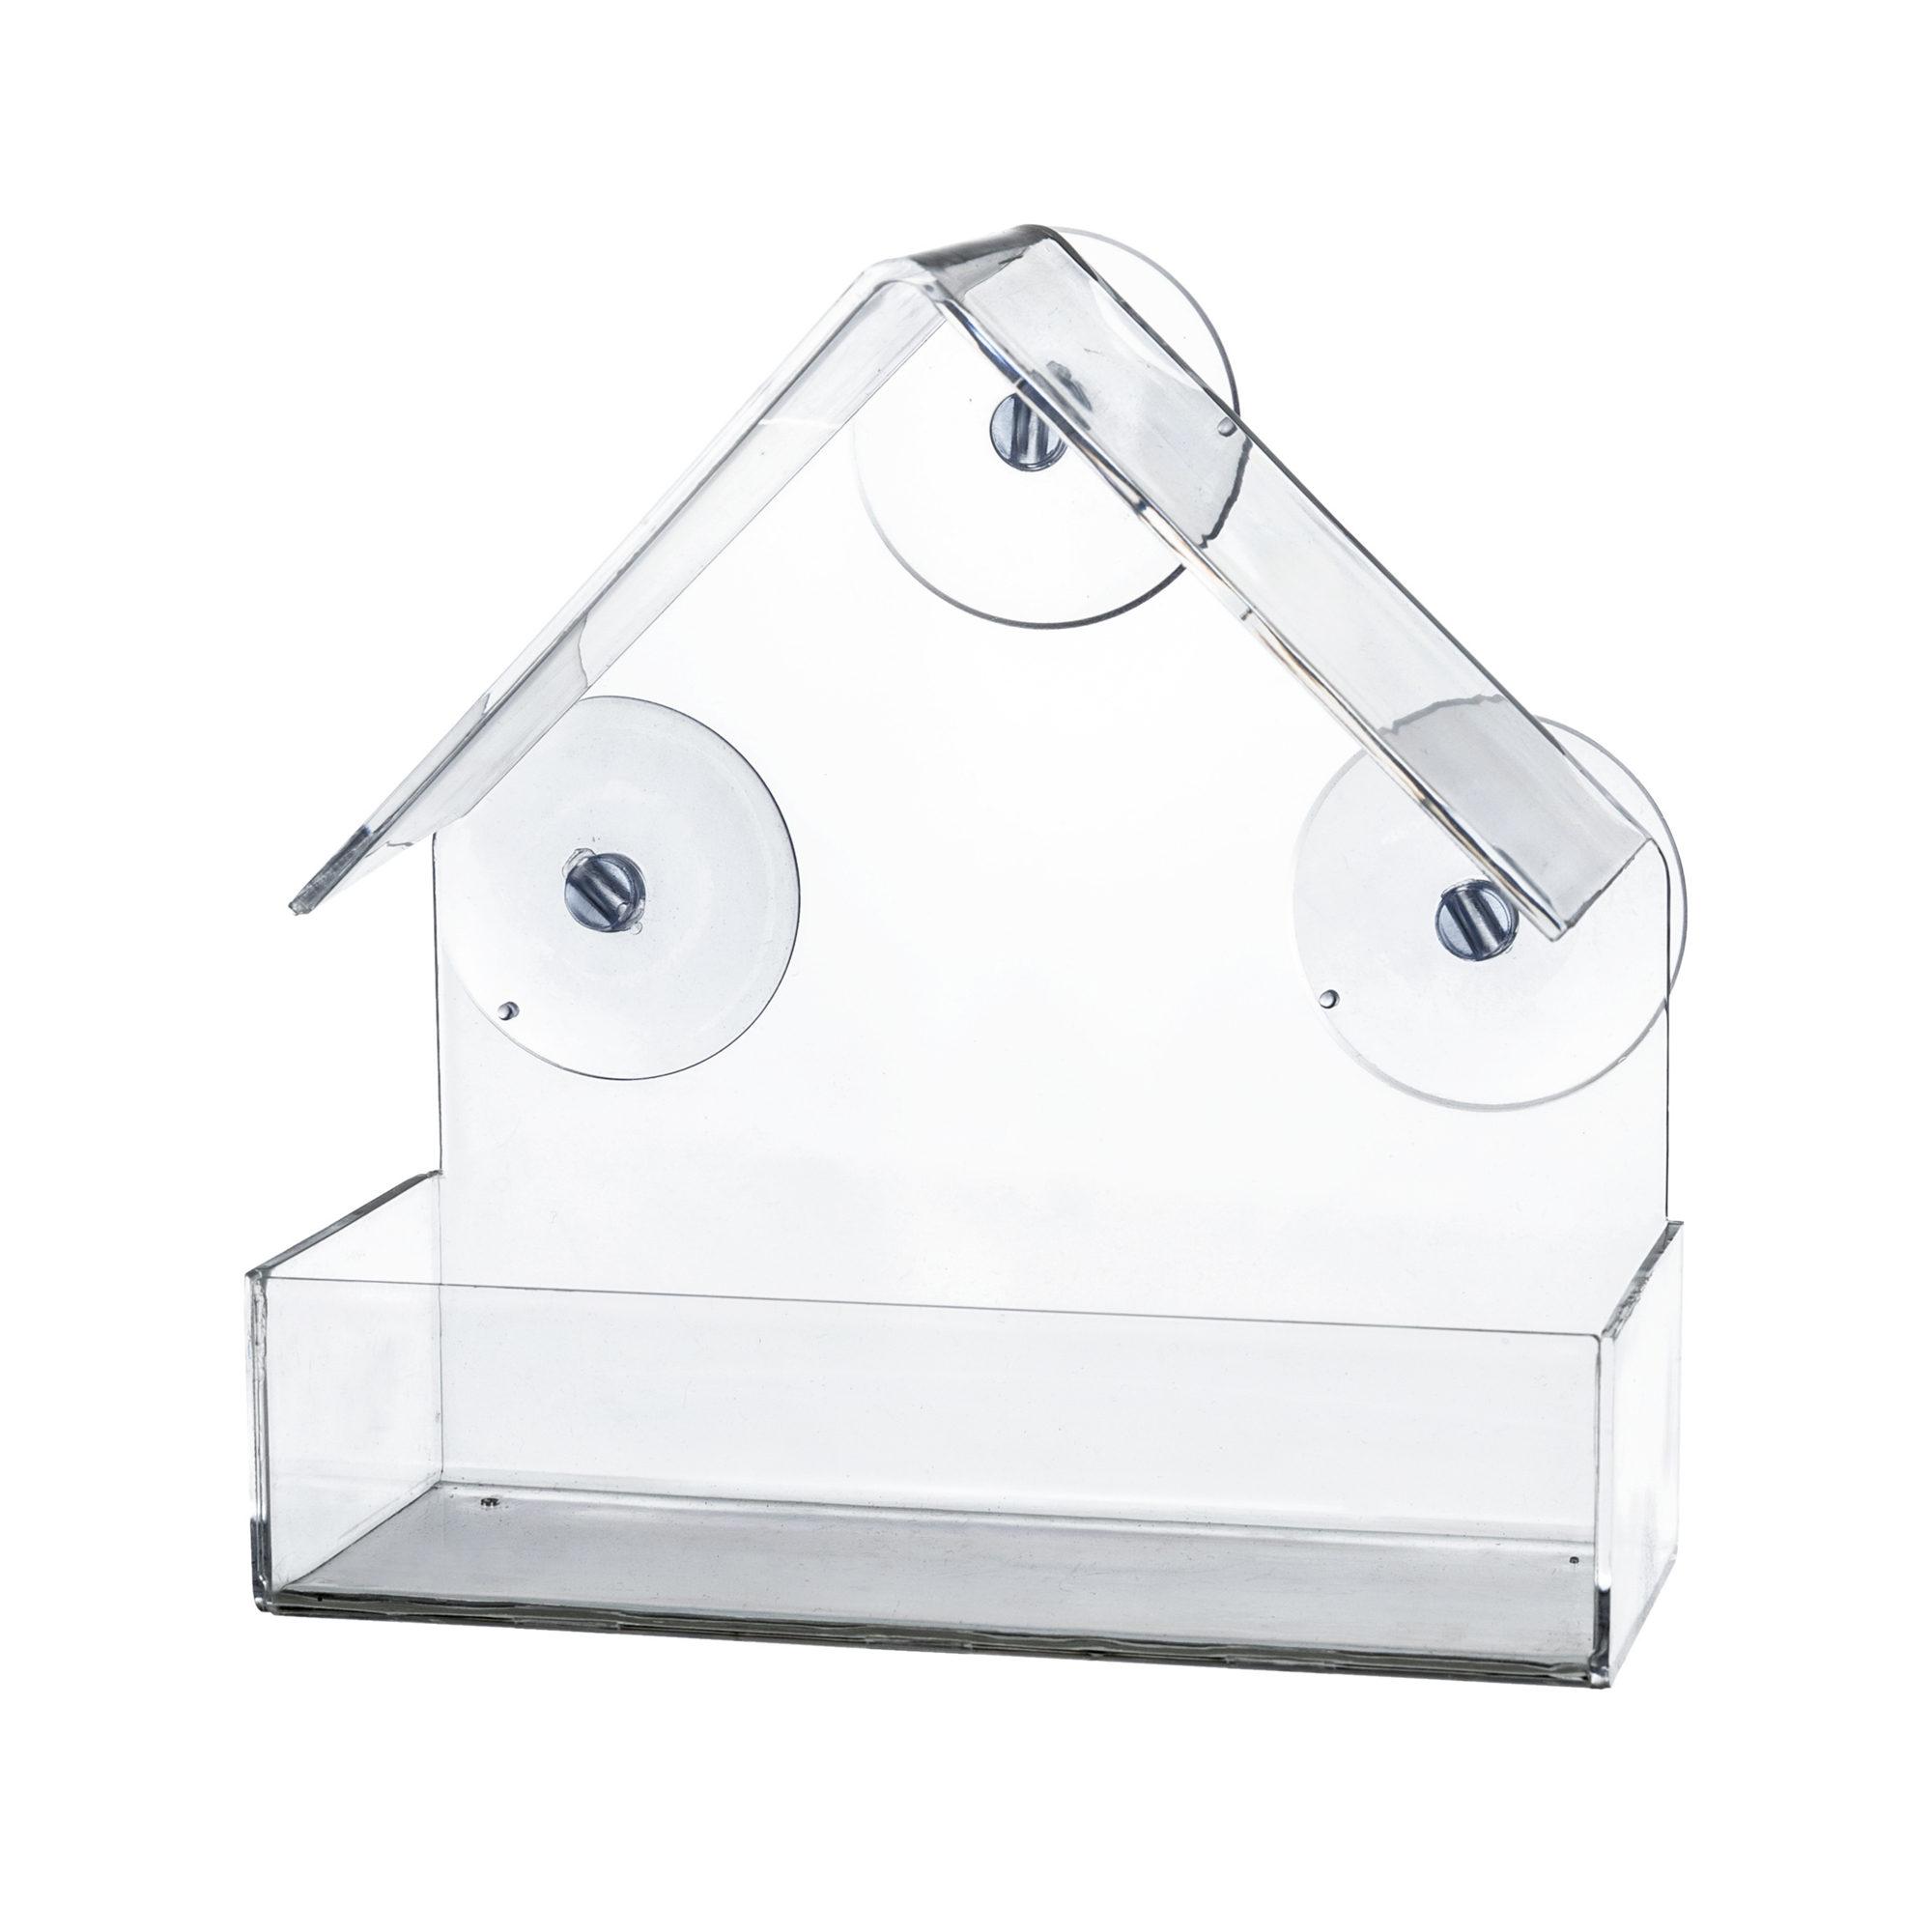 Trixie Fenster-Futterhaus transparent